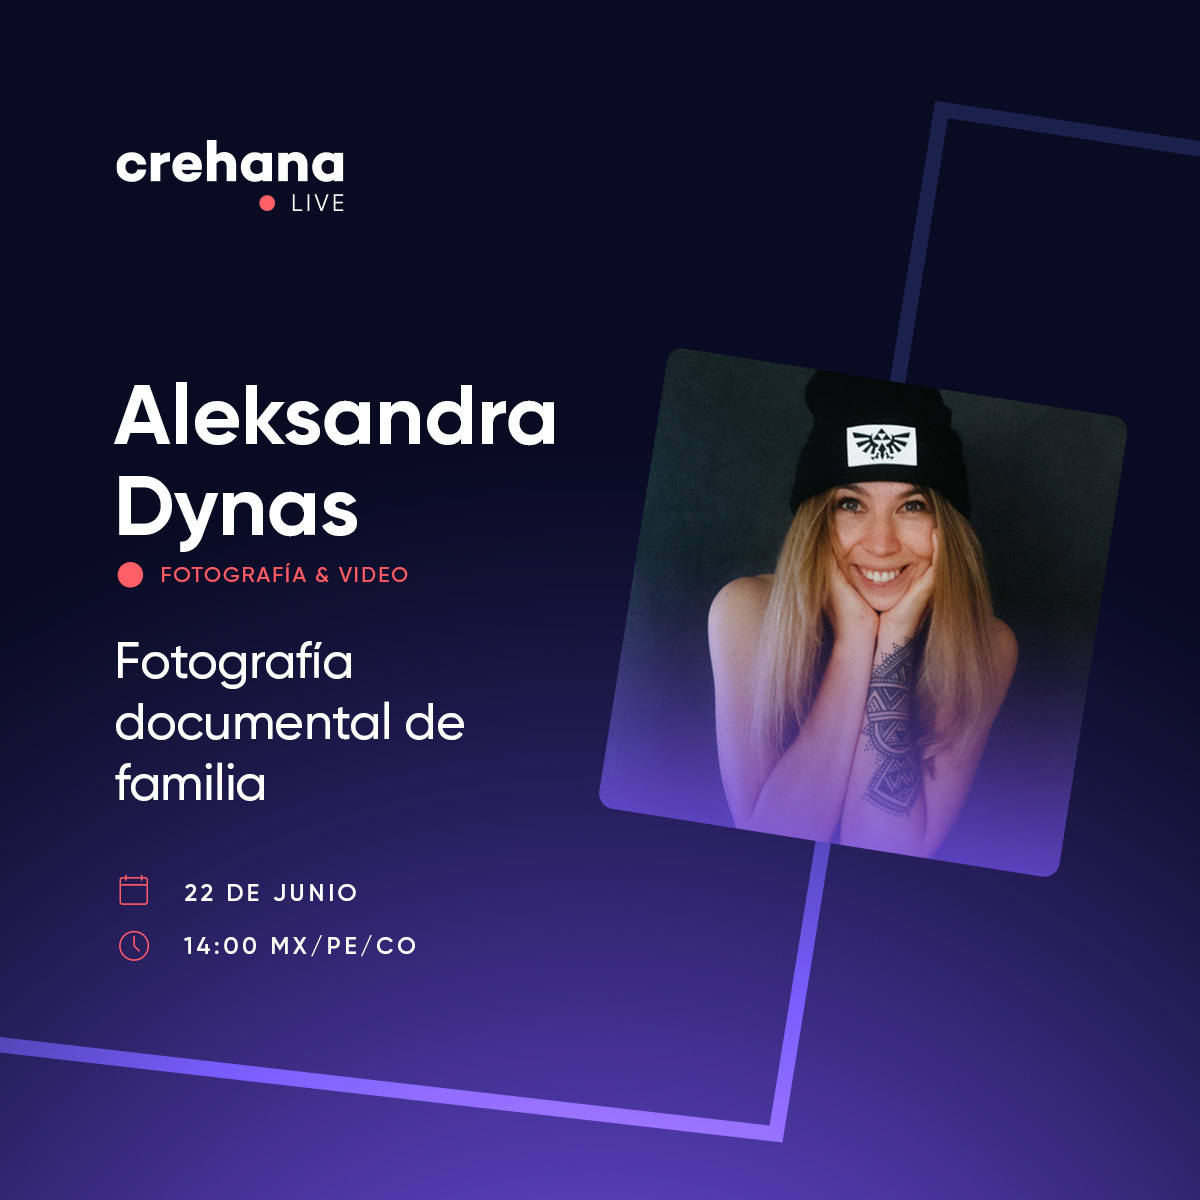 crehana live